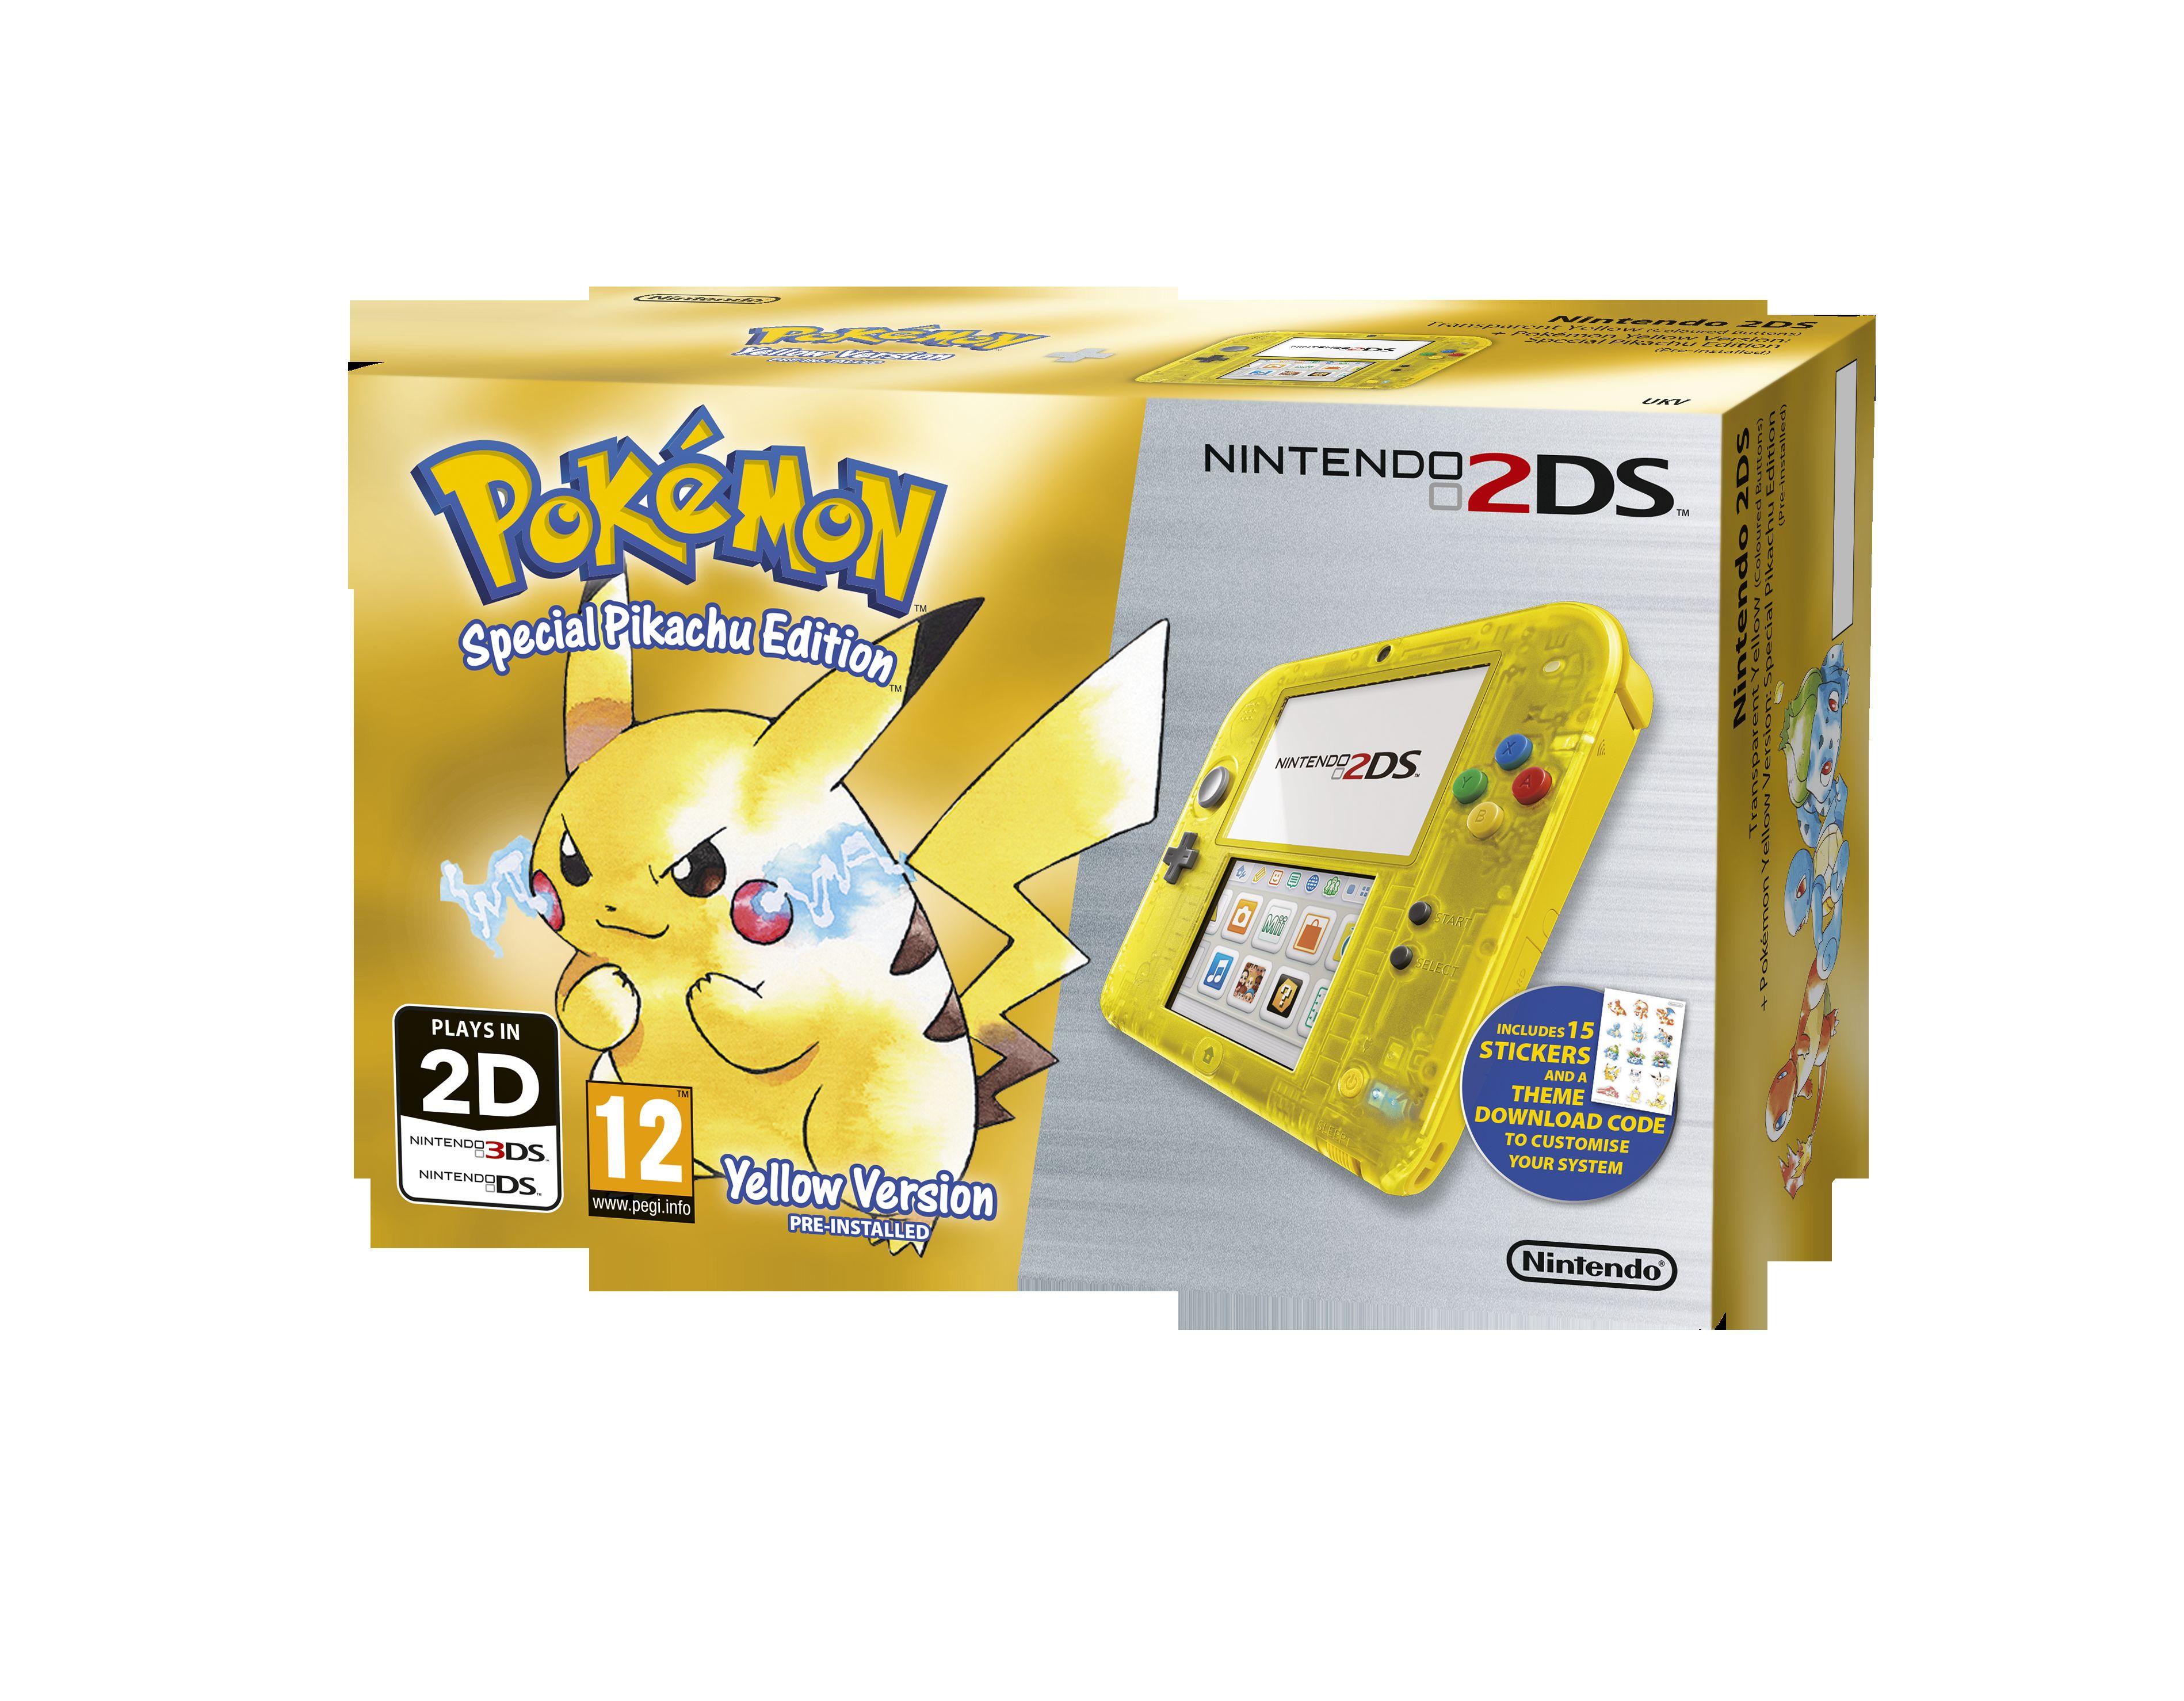 Sky Box Sets Bundle >> Pokémon news (Jan. 15) - Pokkén: new fighter, game modes, screens; more - Perfectly Nintendo